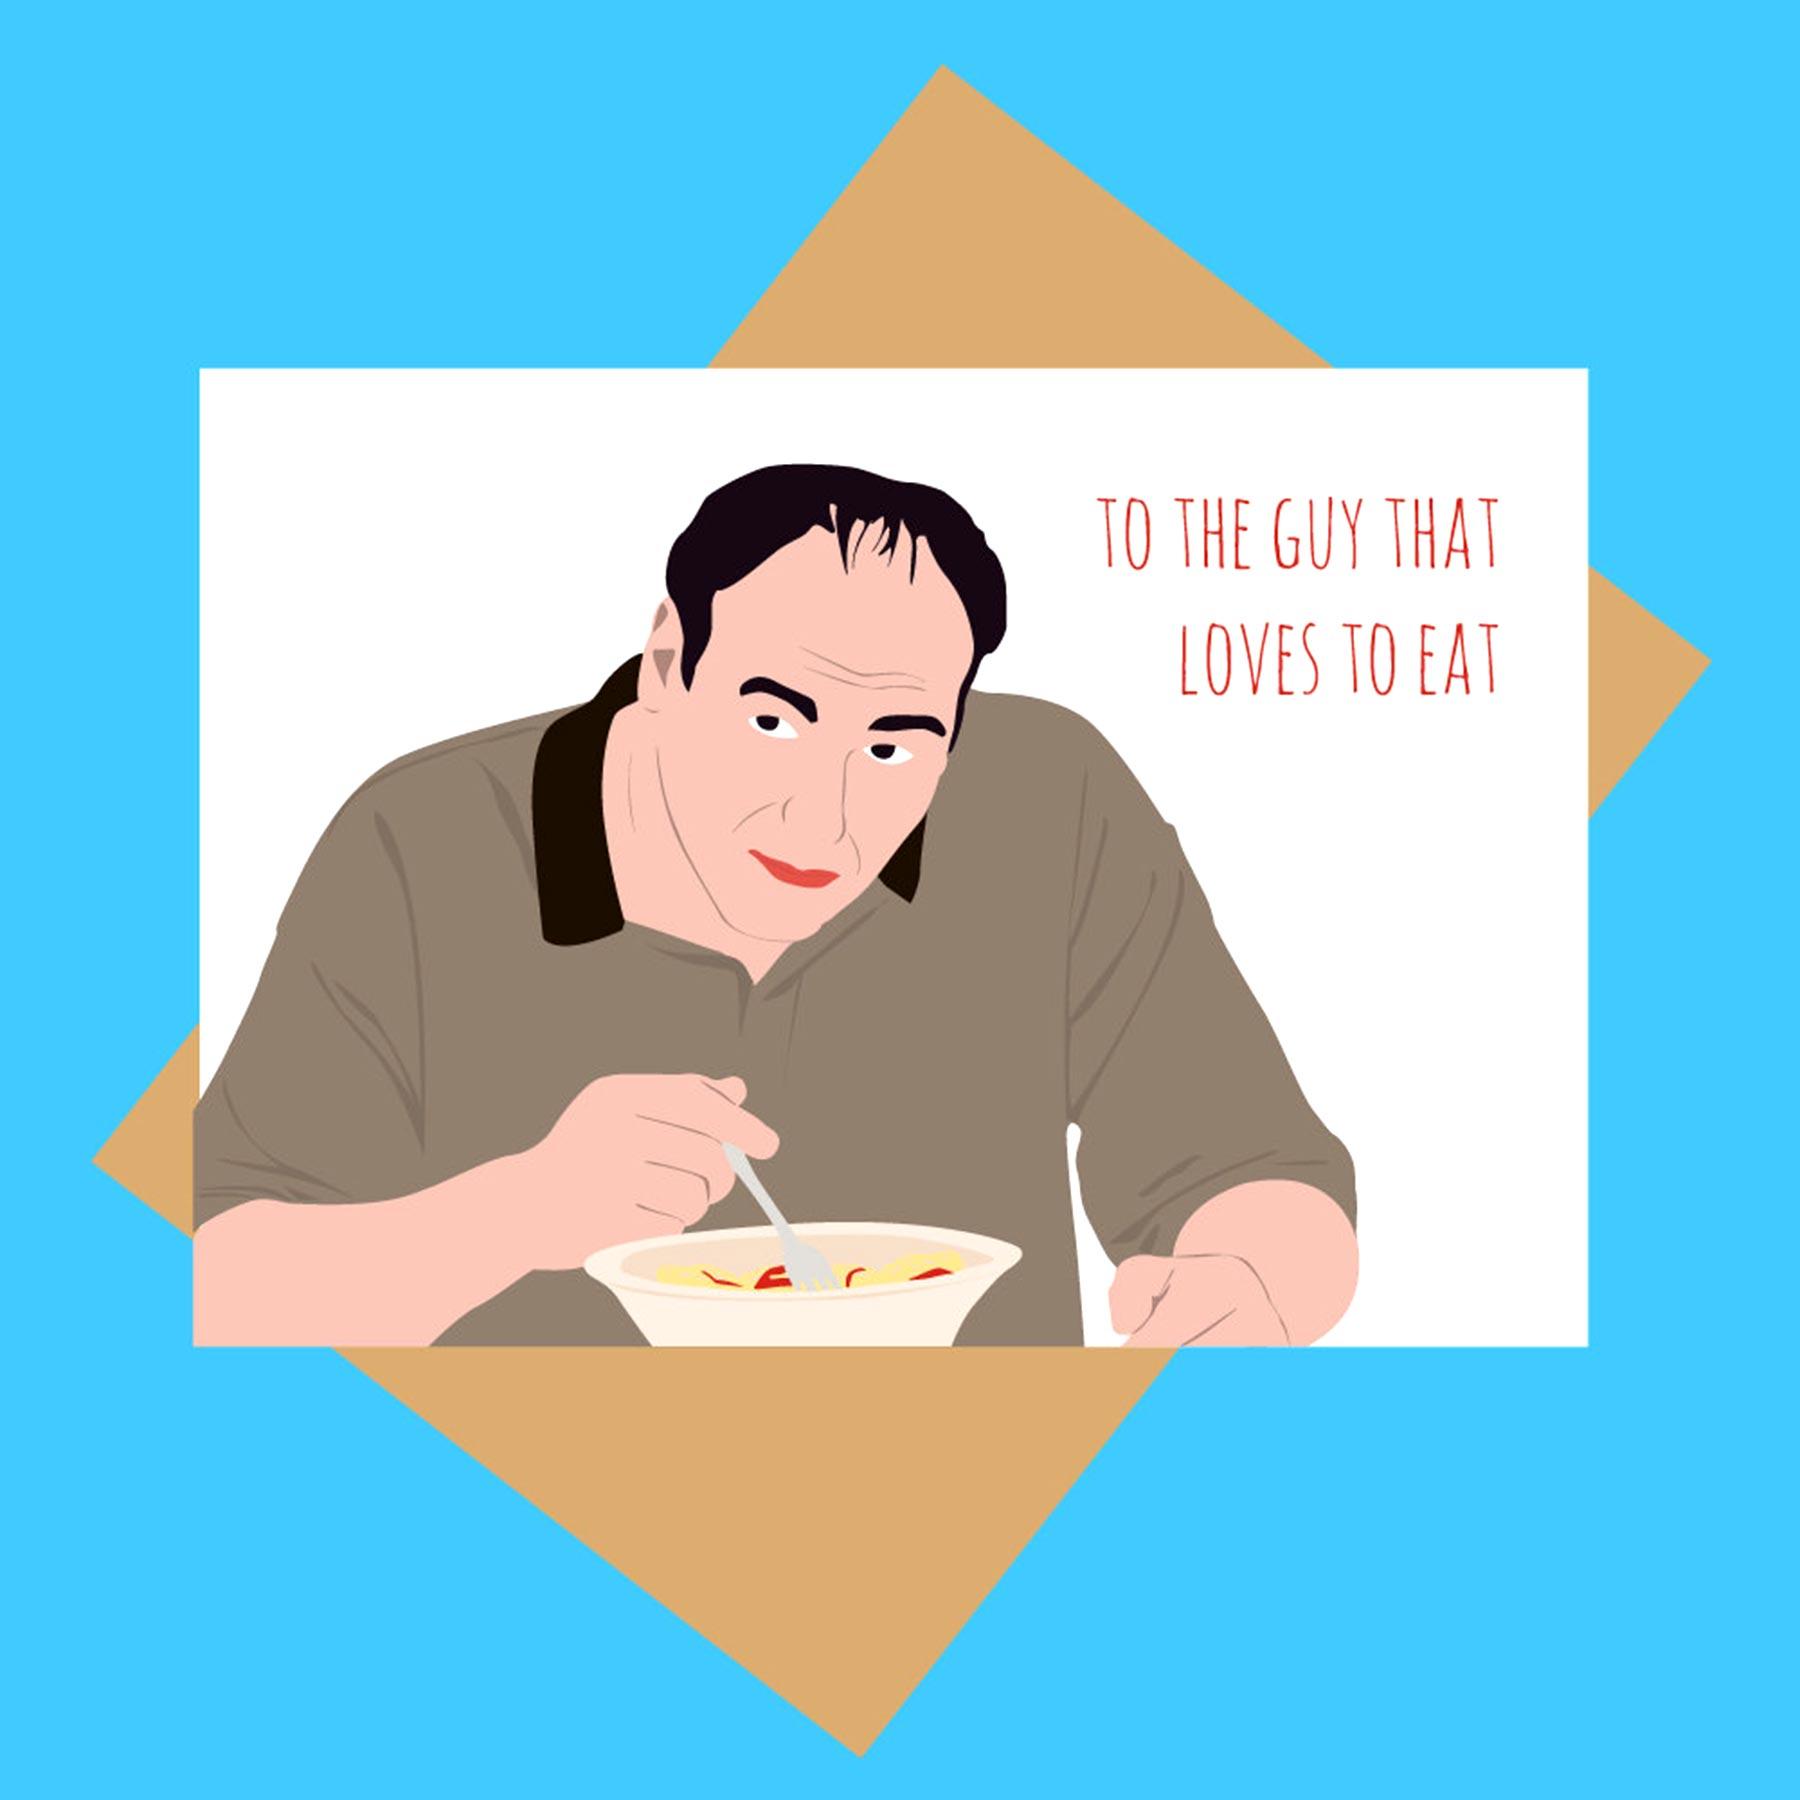 Sopranos card - Tony Soprano - Funny Father's Day card$4.24MeetMeInShermer